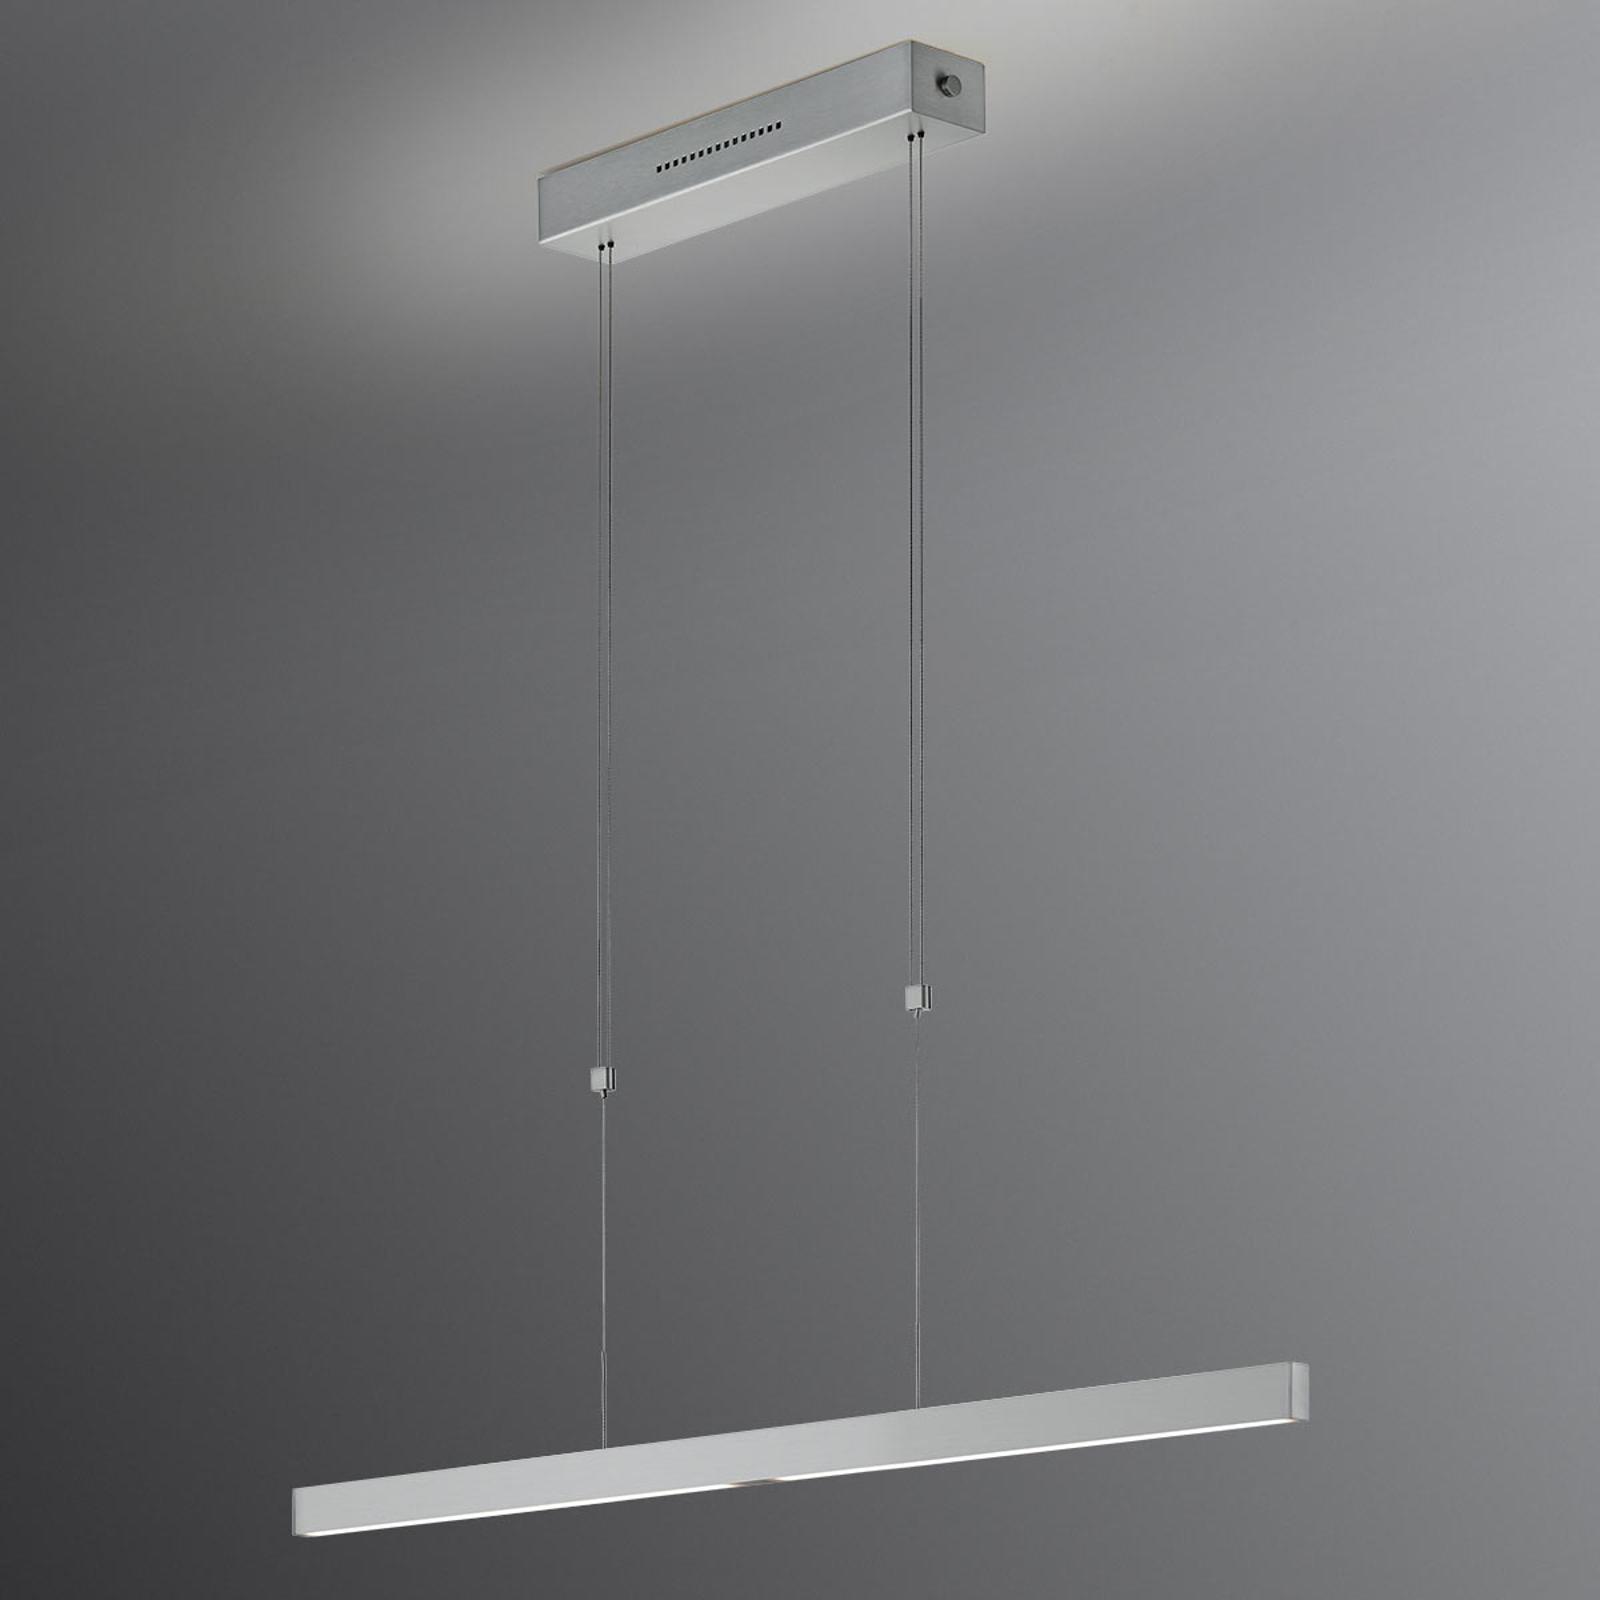 LED-Hängelampe Pia Gestensensor nickel matt 68 cm